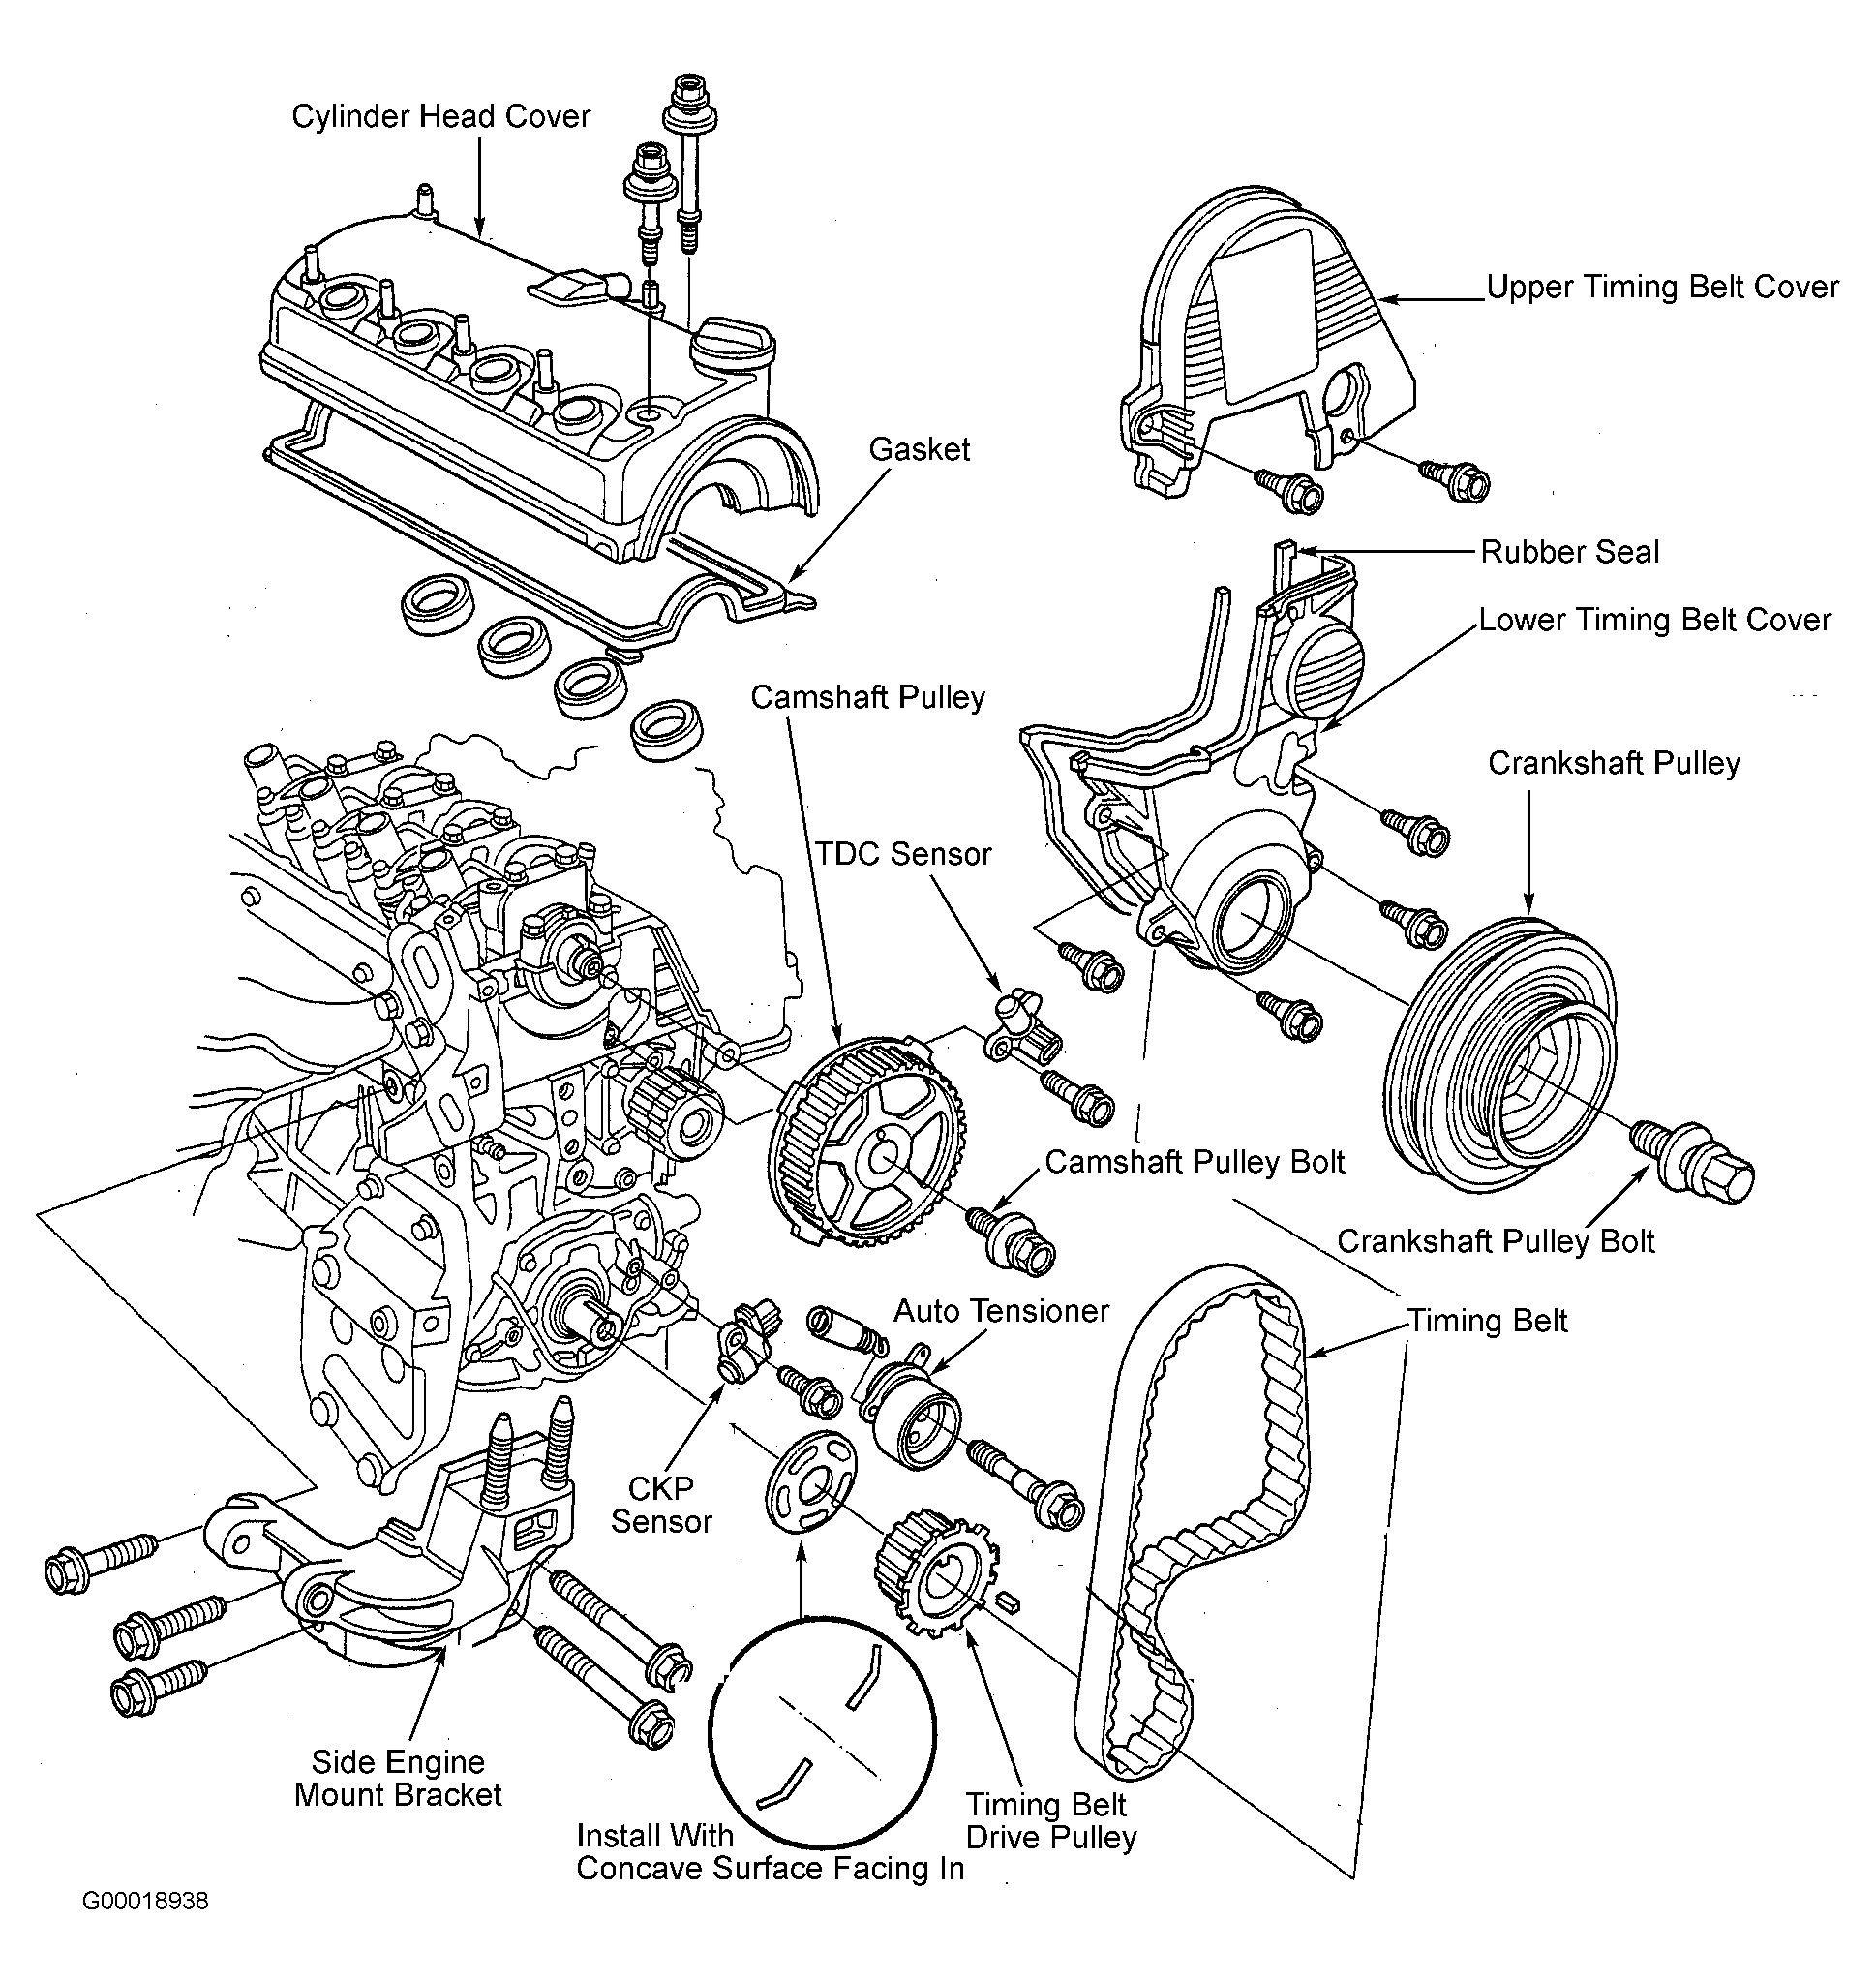 2004 Hyundai Santa Fe Spark Plug Wire Diagram